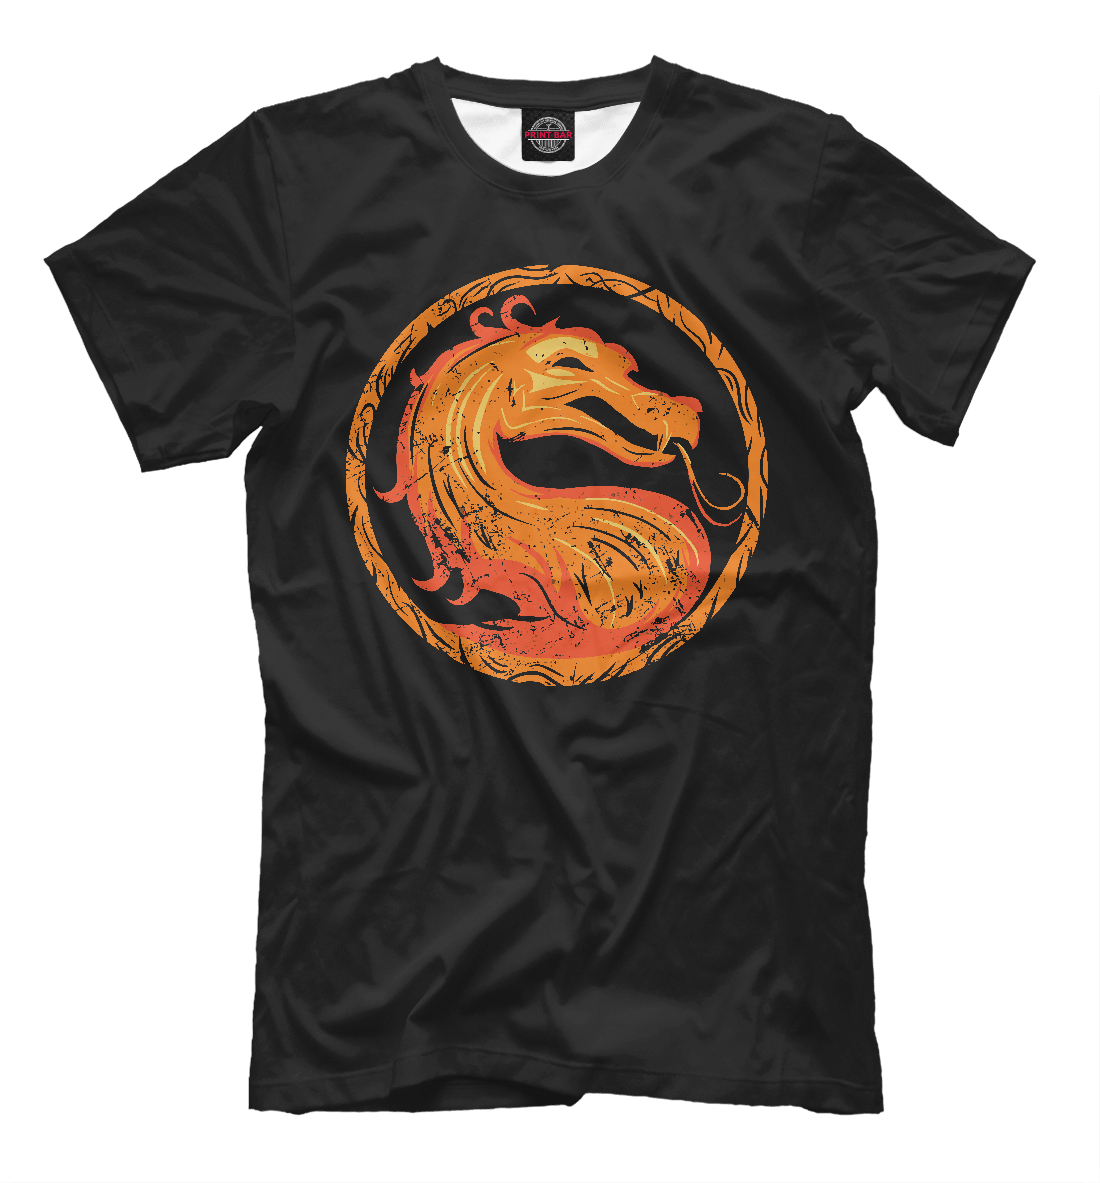 Mortal Kombat, Printbar, Футболки, MKB-922323-fut-2  - купить со скидкой